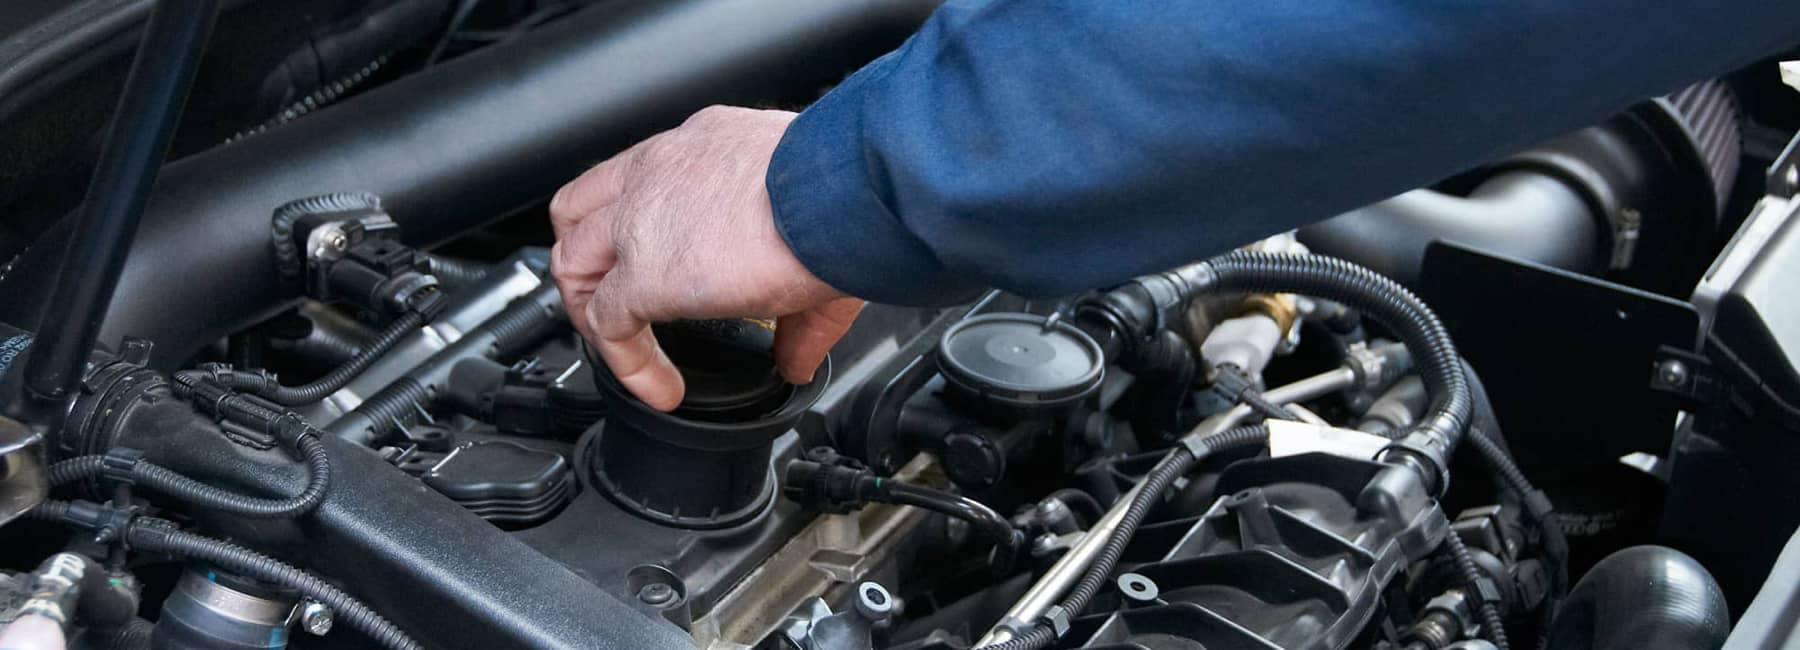 service technician working on engine